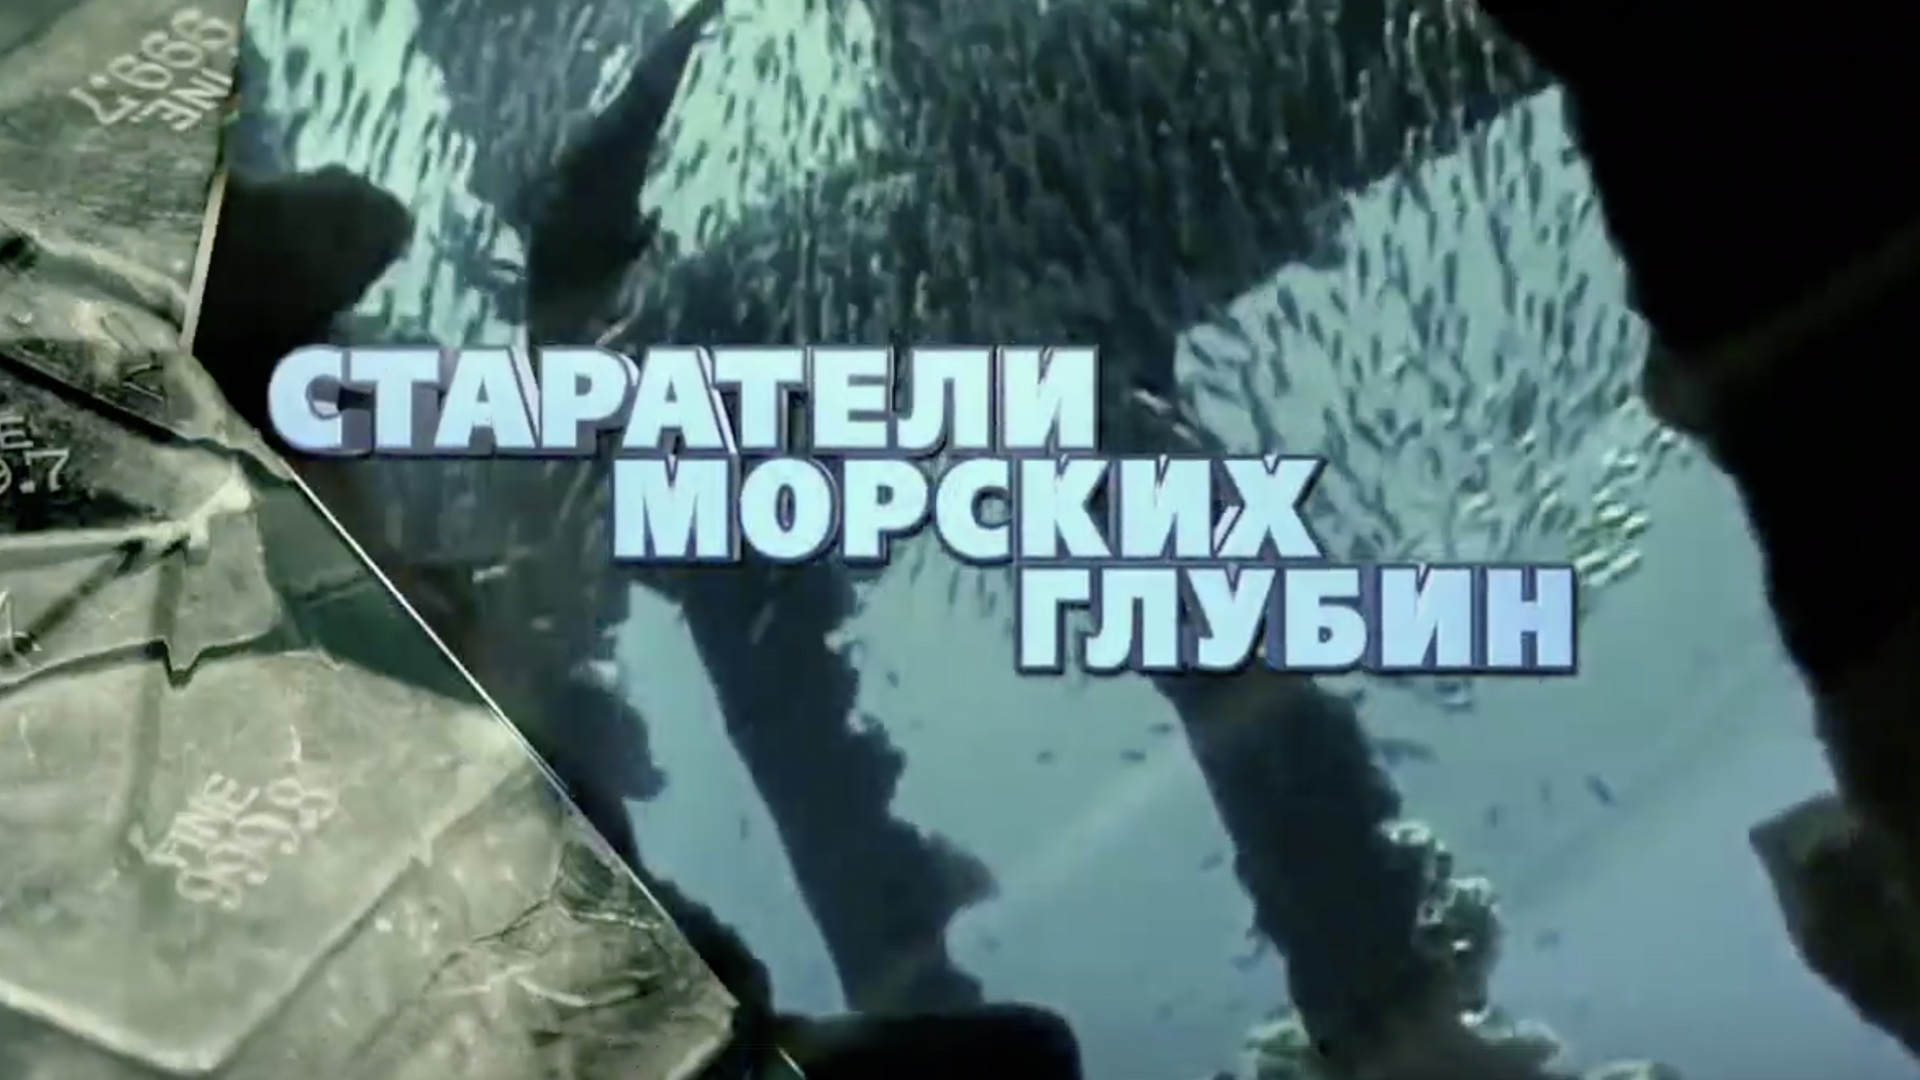 Старатели морских глубин. Найти затонувшие миллиарды